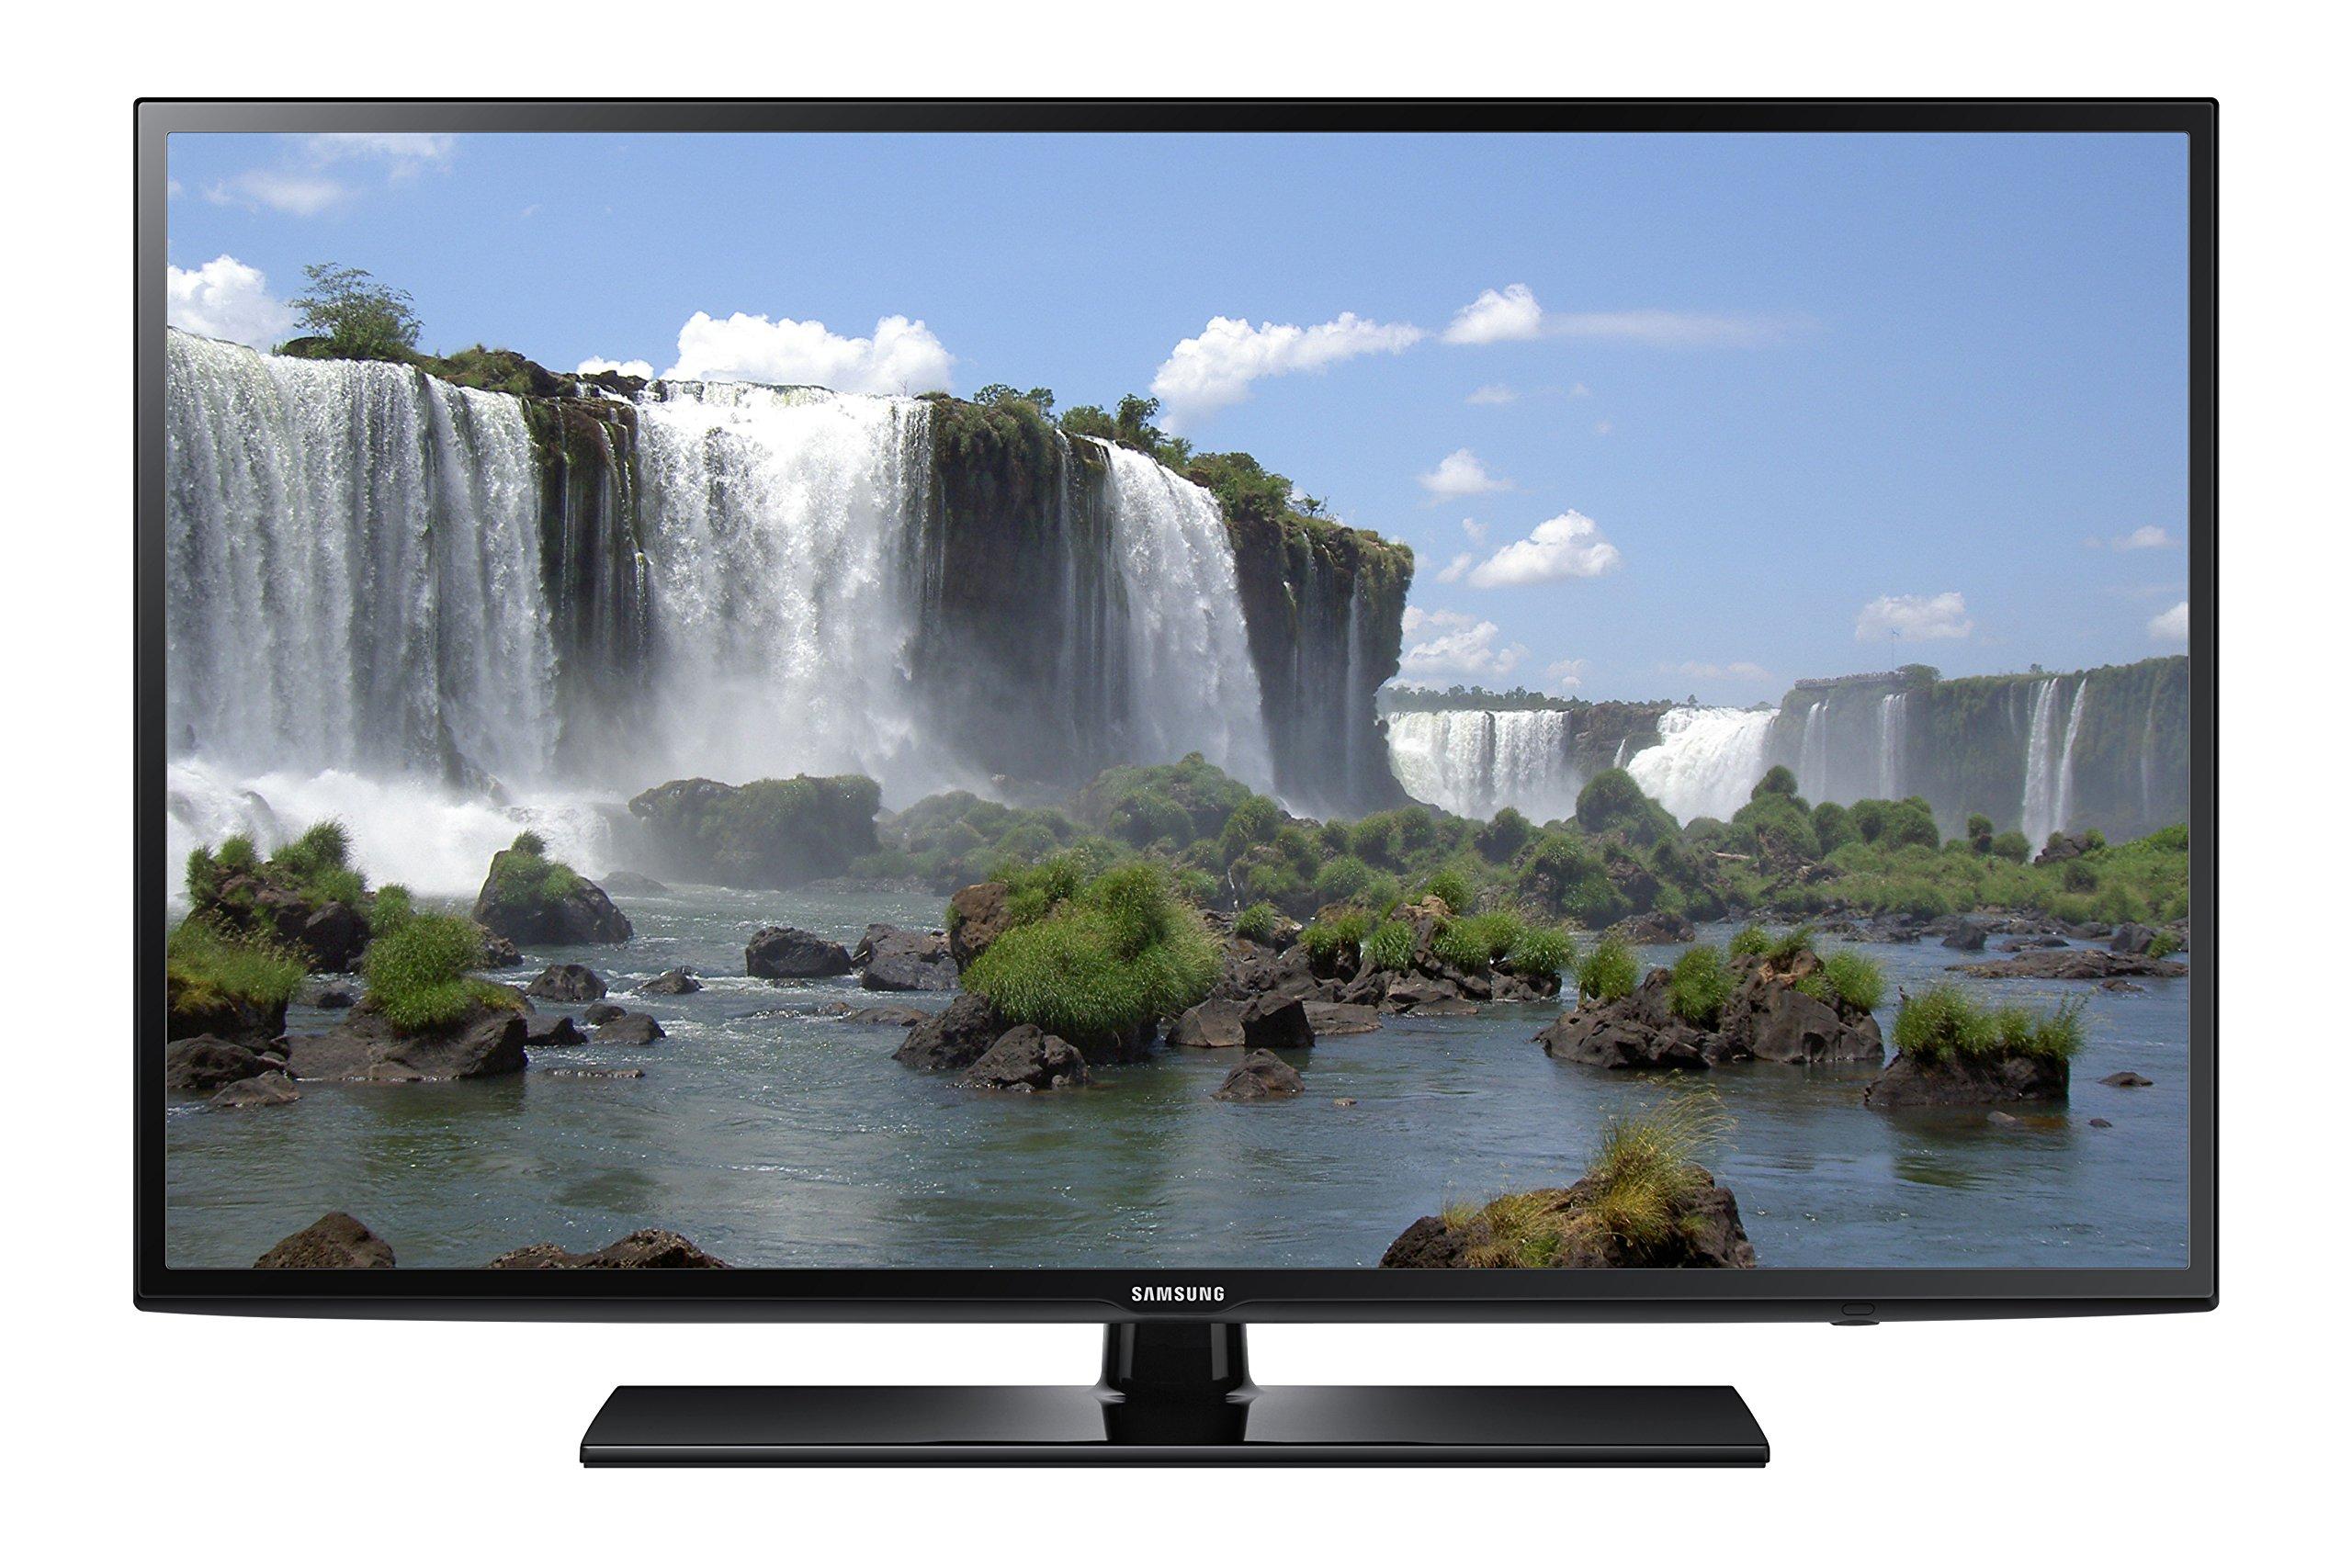 Samsung UN40J6200 40-Inch 1080p Smart LED TV (2015 Model)